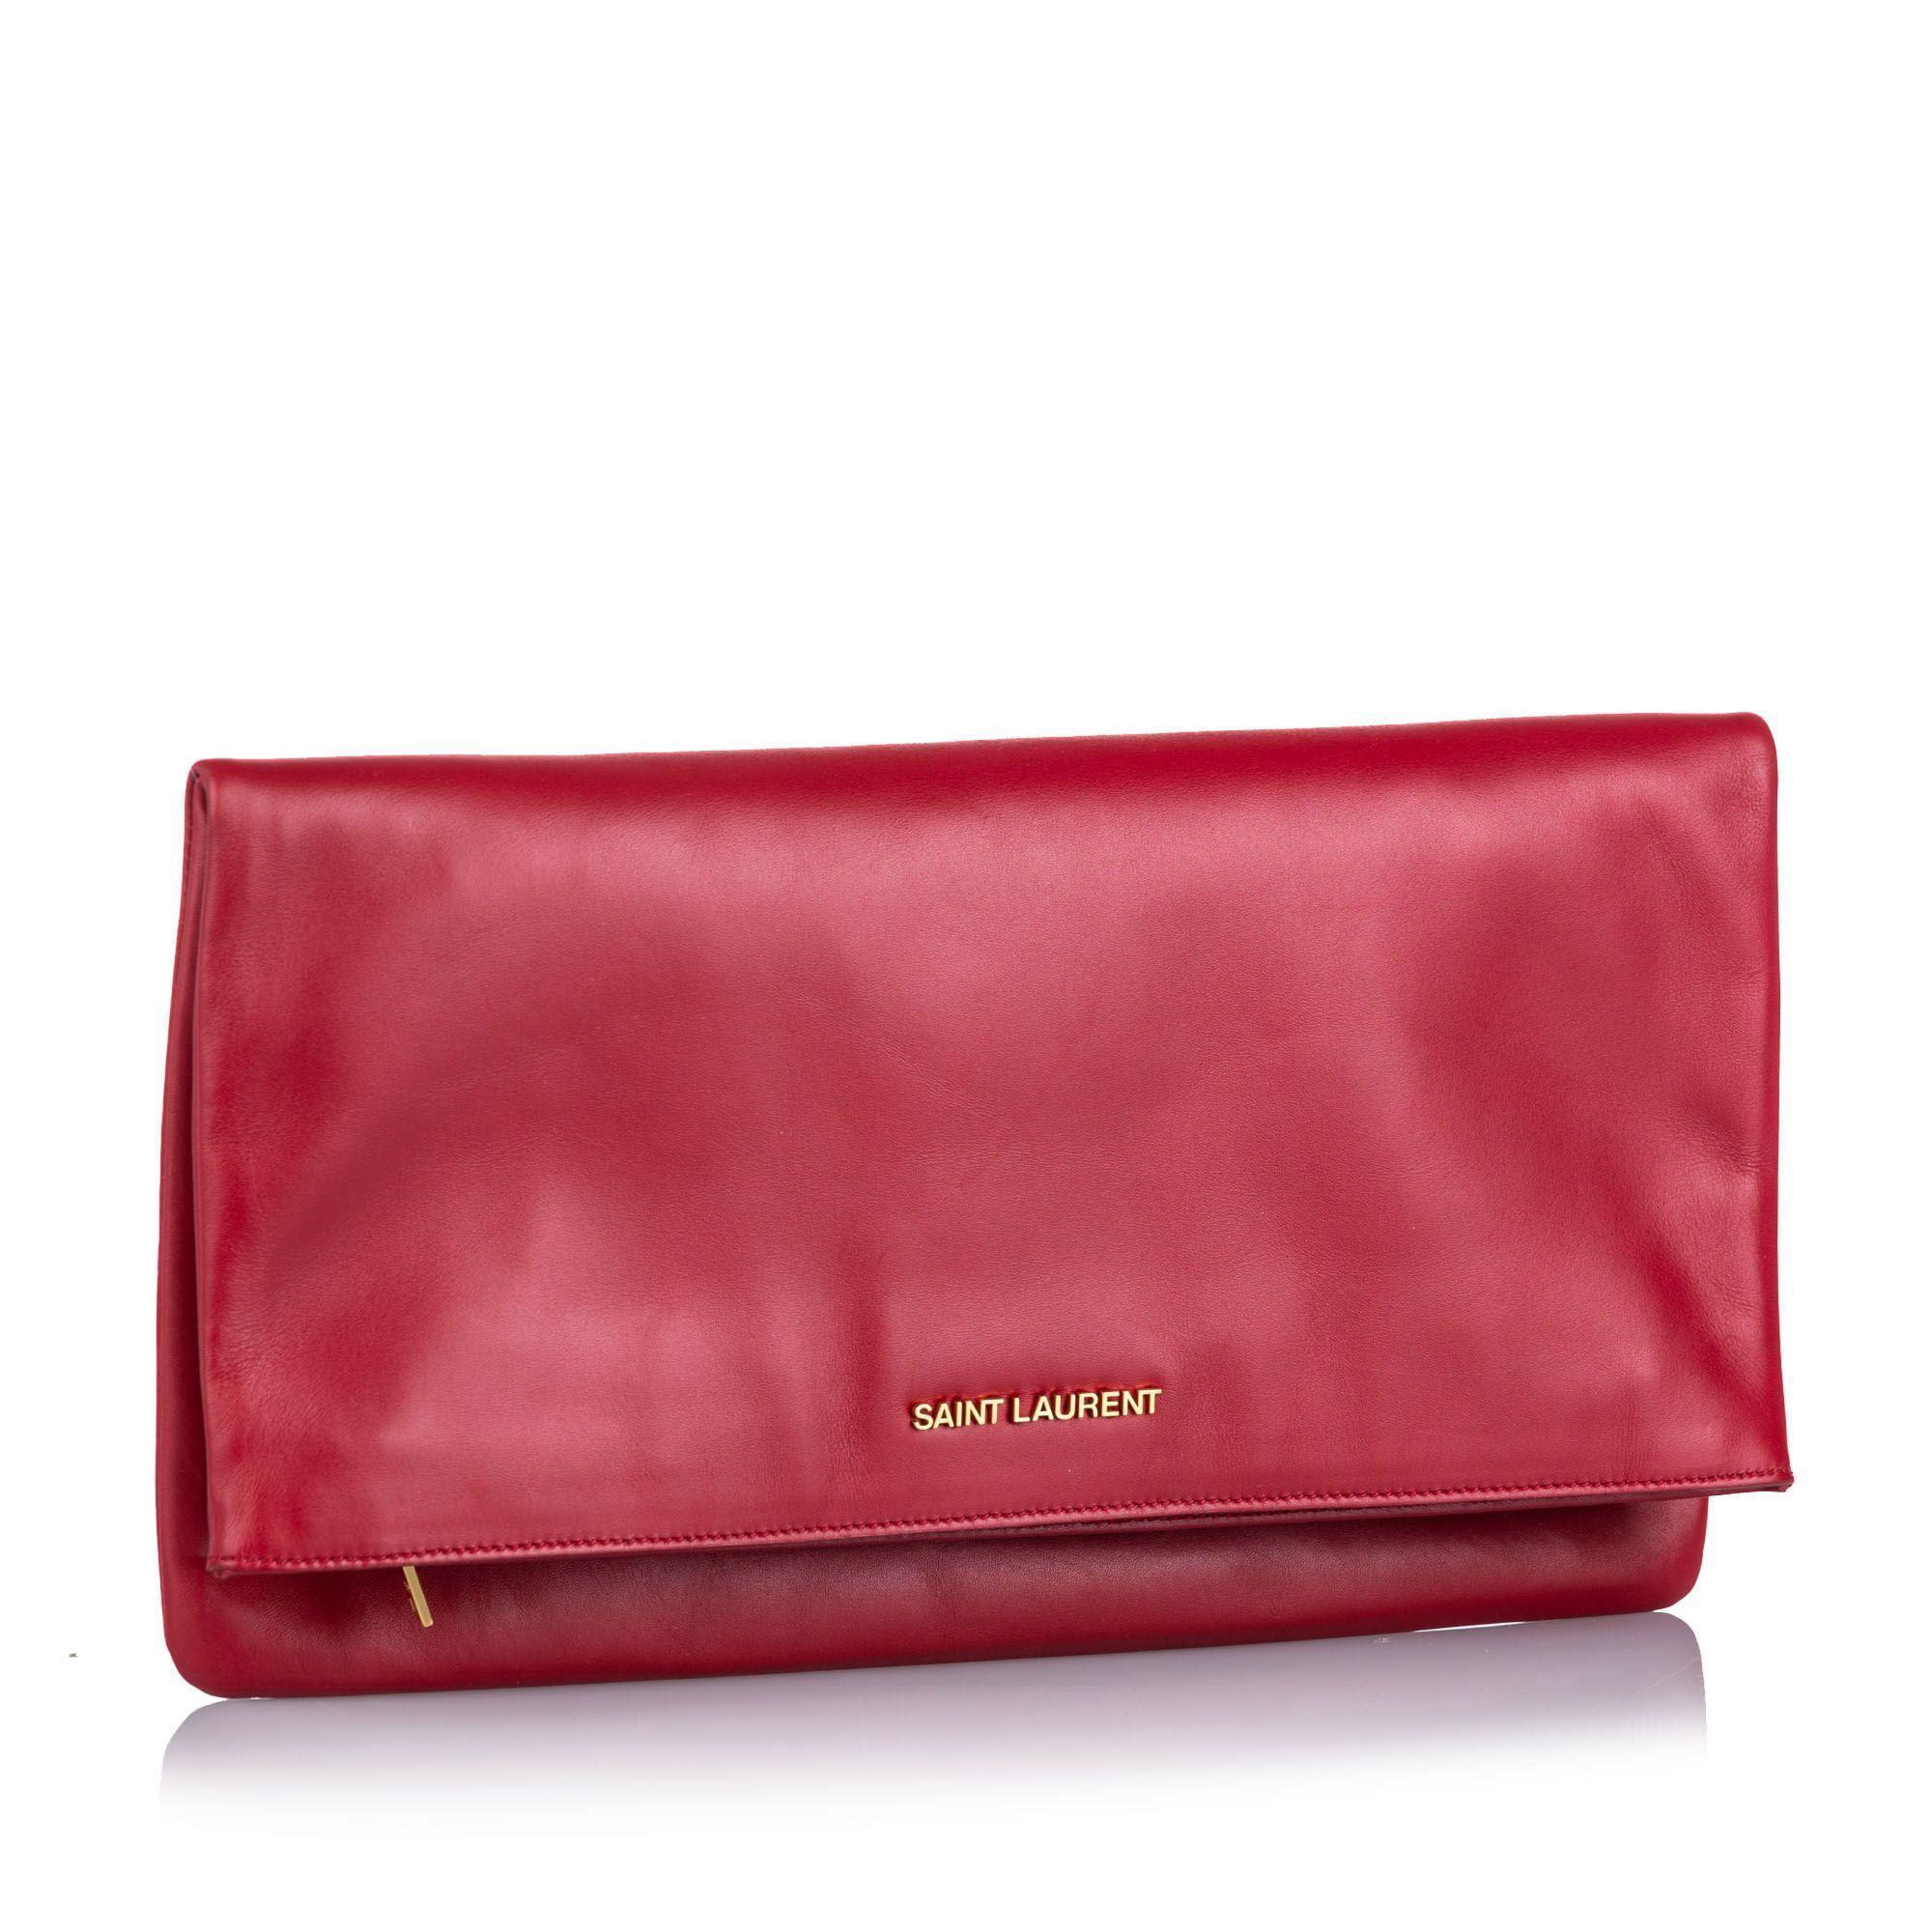 Vintage YSL Leather Fold Over Clutch Bag Red